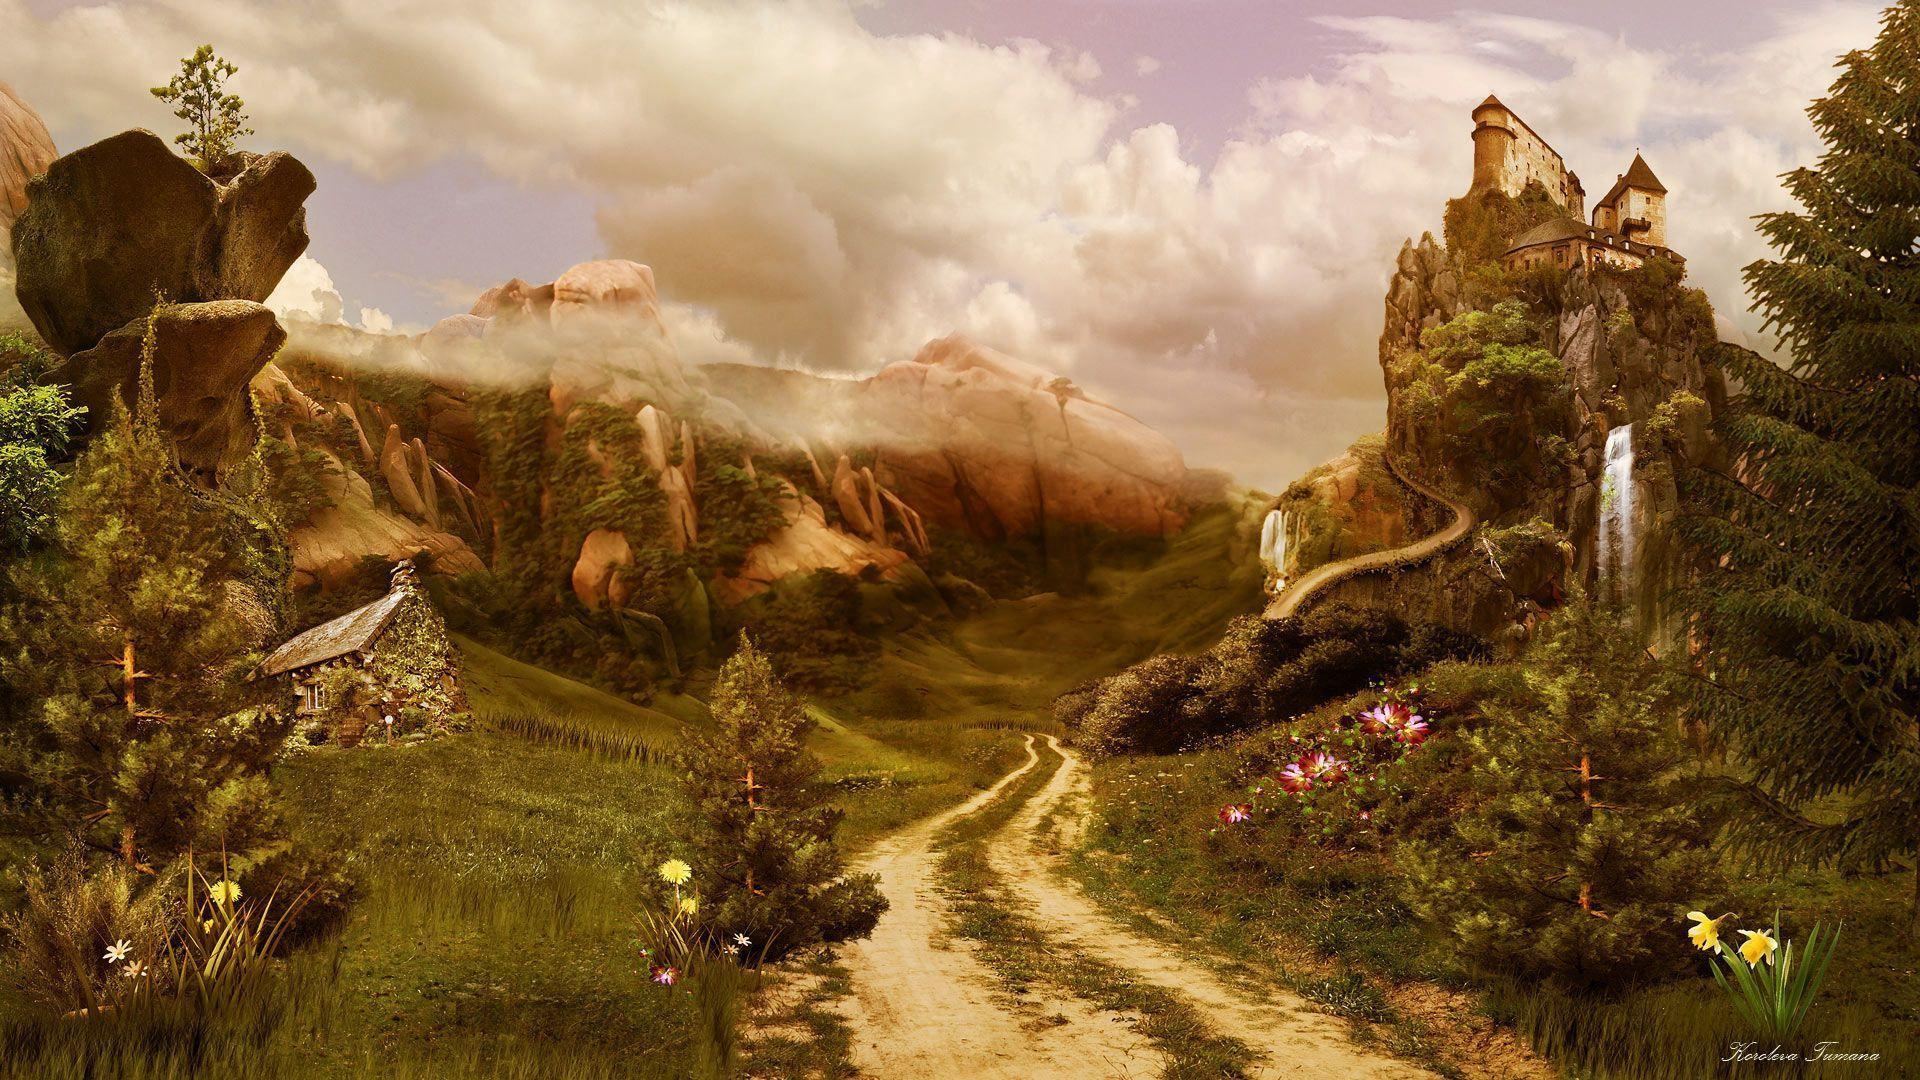 Fairy tale wallpapers wallpaper cave - Fantastic girl wallpaper hd ...